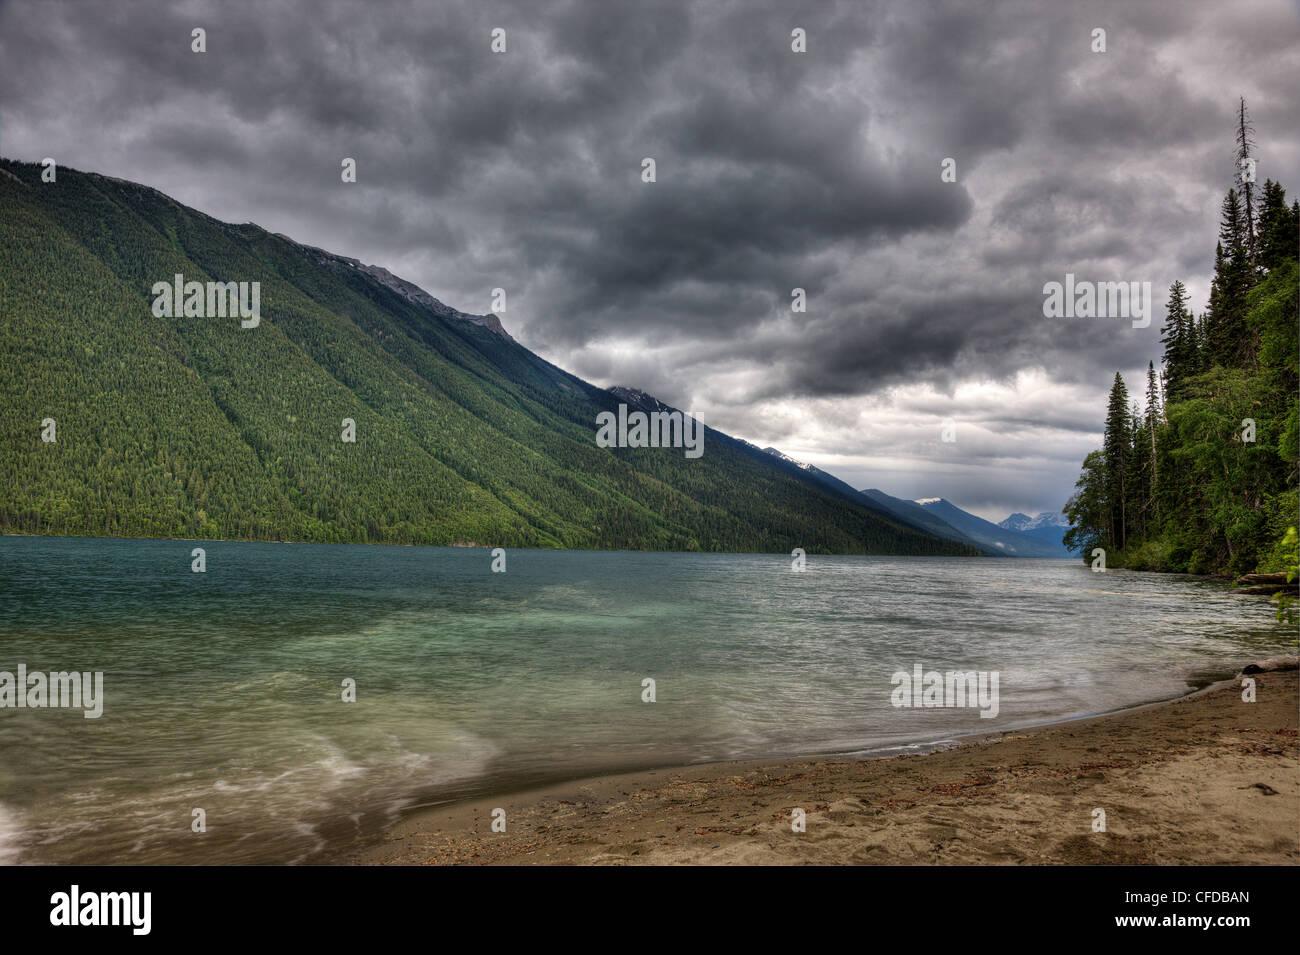 Storm over Isaac Lake in Bowron Lake Park British Columbia, Canada Stock Photo